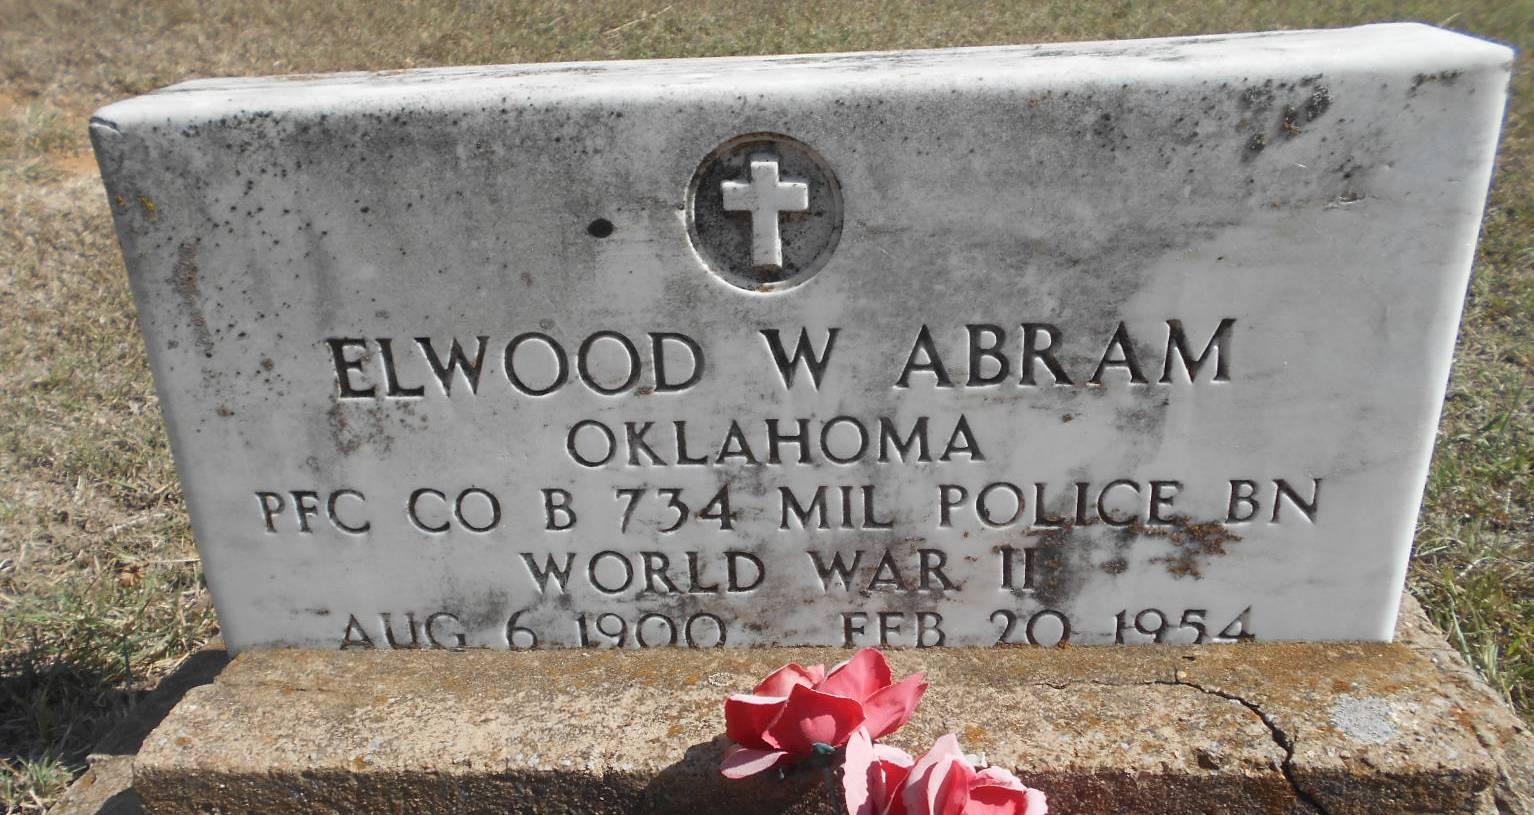 Elwood W Abram